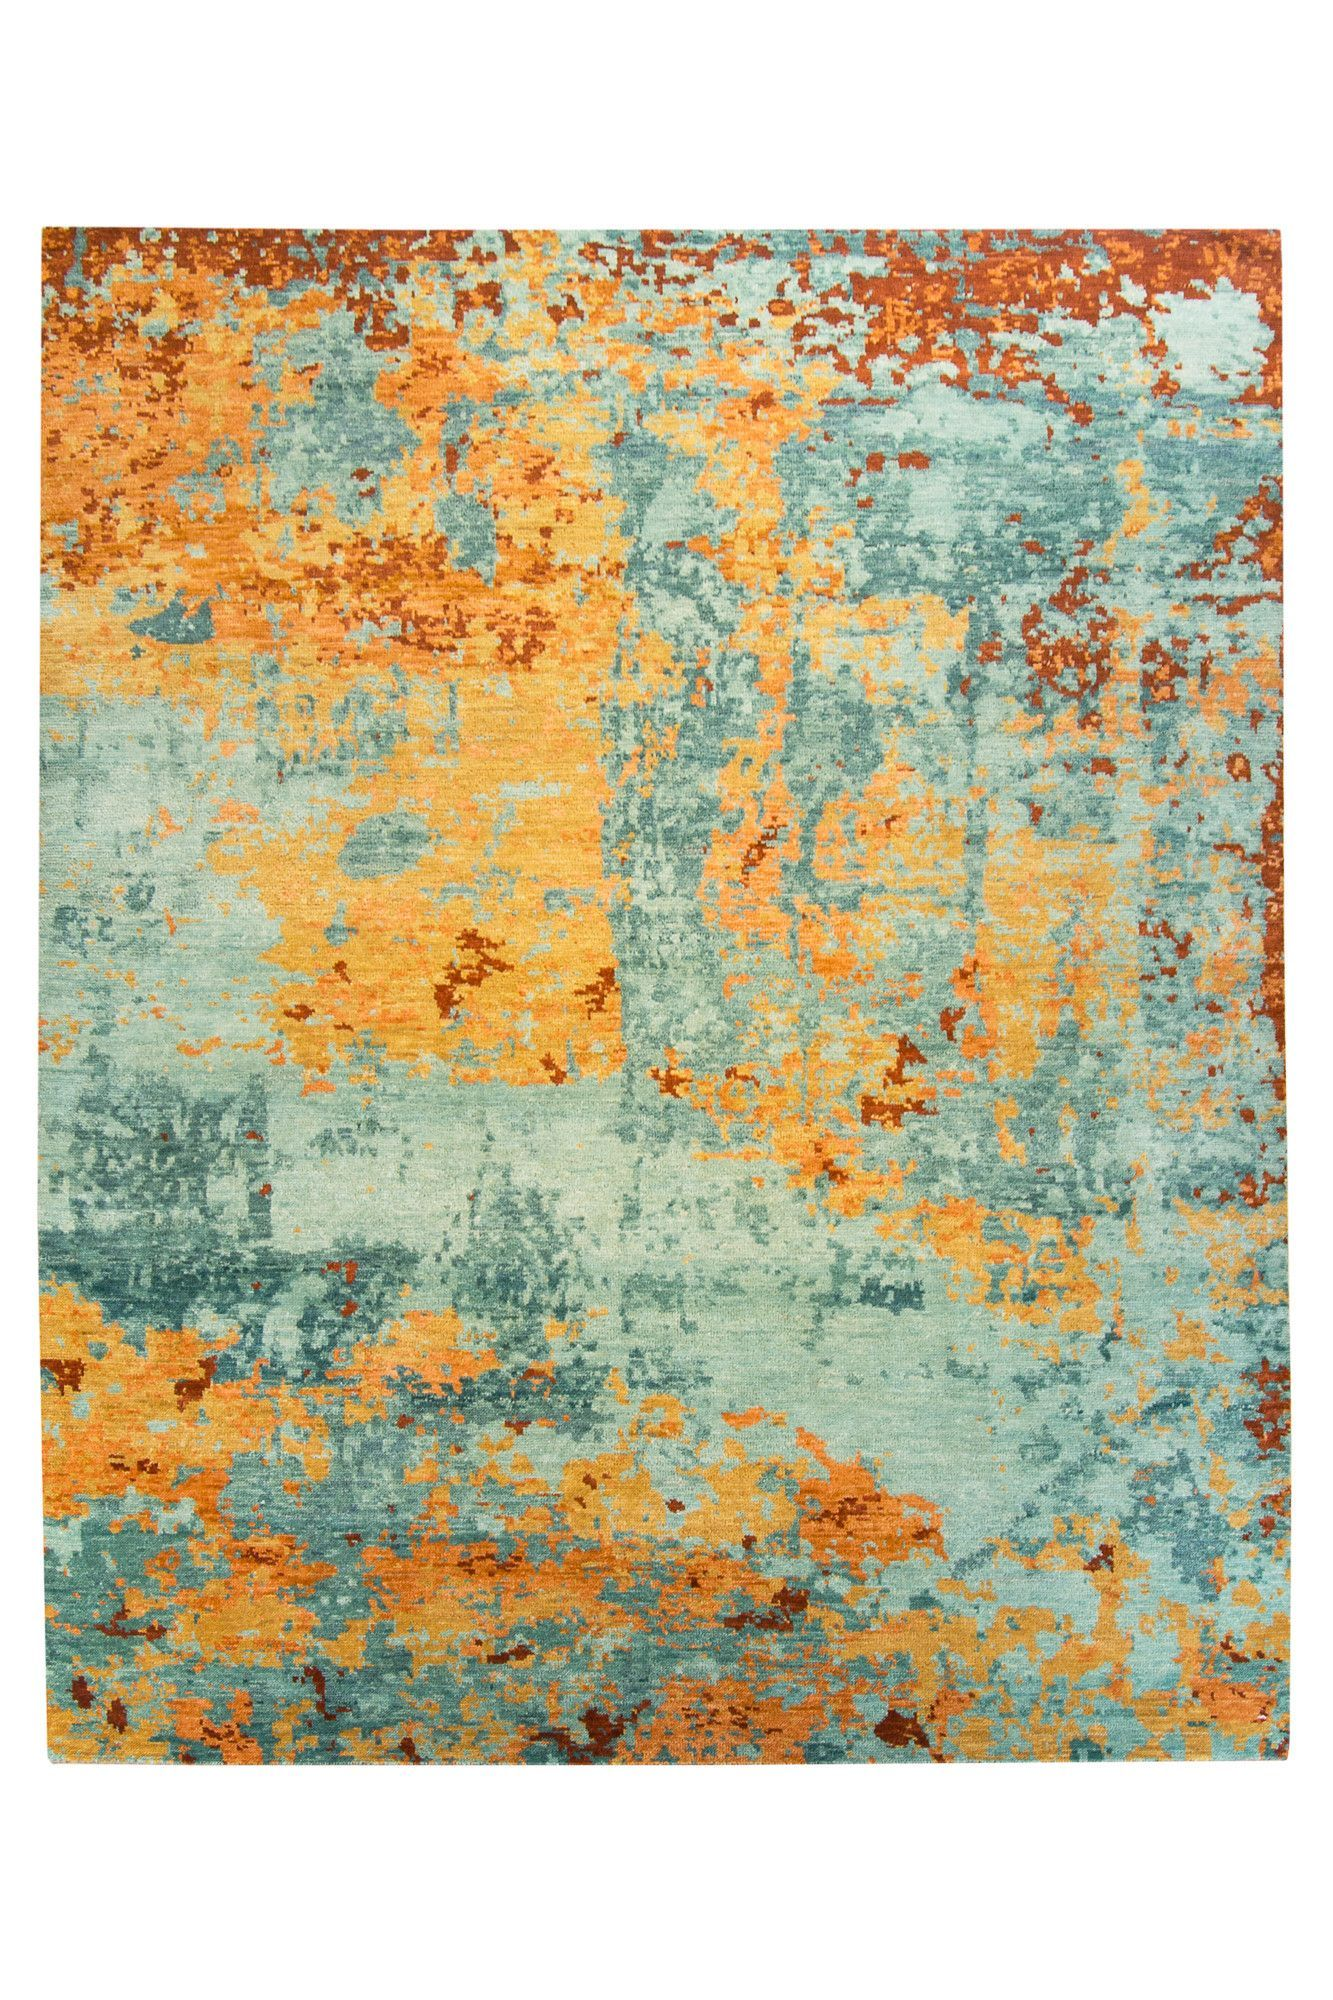 Abstract Teal Orange Rug 8x10 Orange Rugs Rugs Teal Cushions